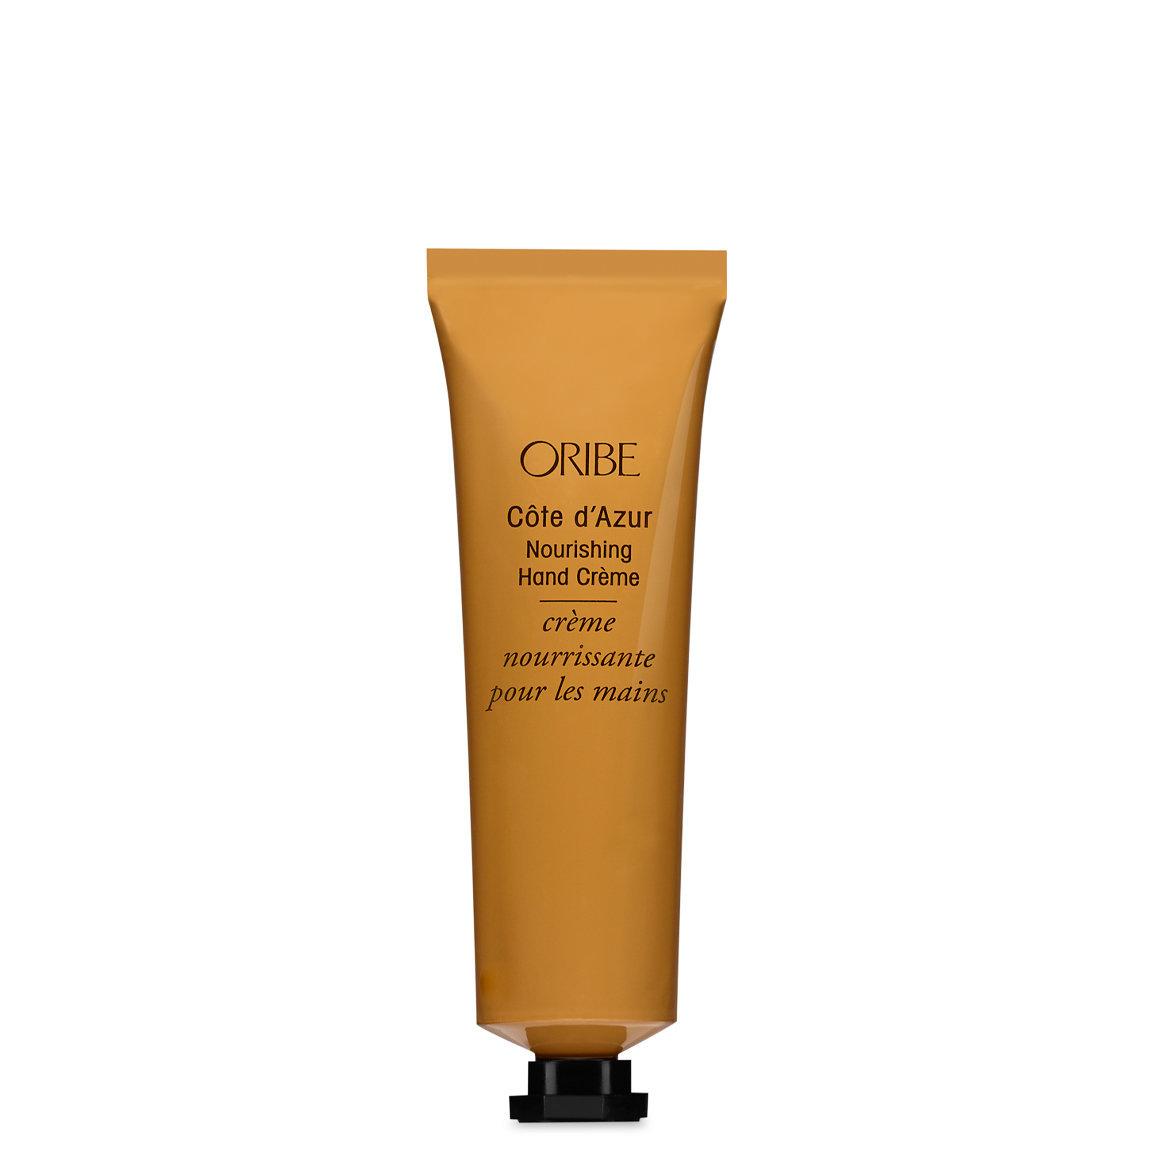 Oribe Cote d'Azur Nourishing Hand Creme 1 oz alternative view 1 - product swatch.